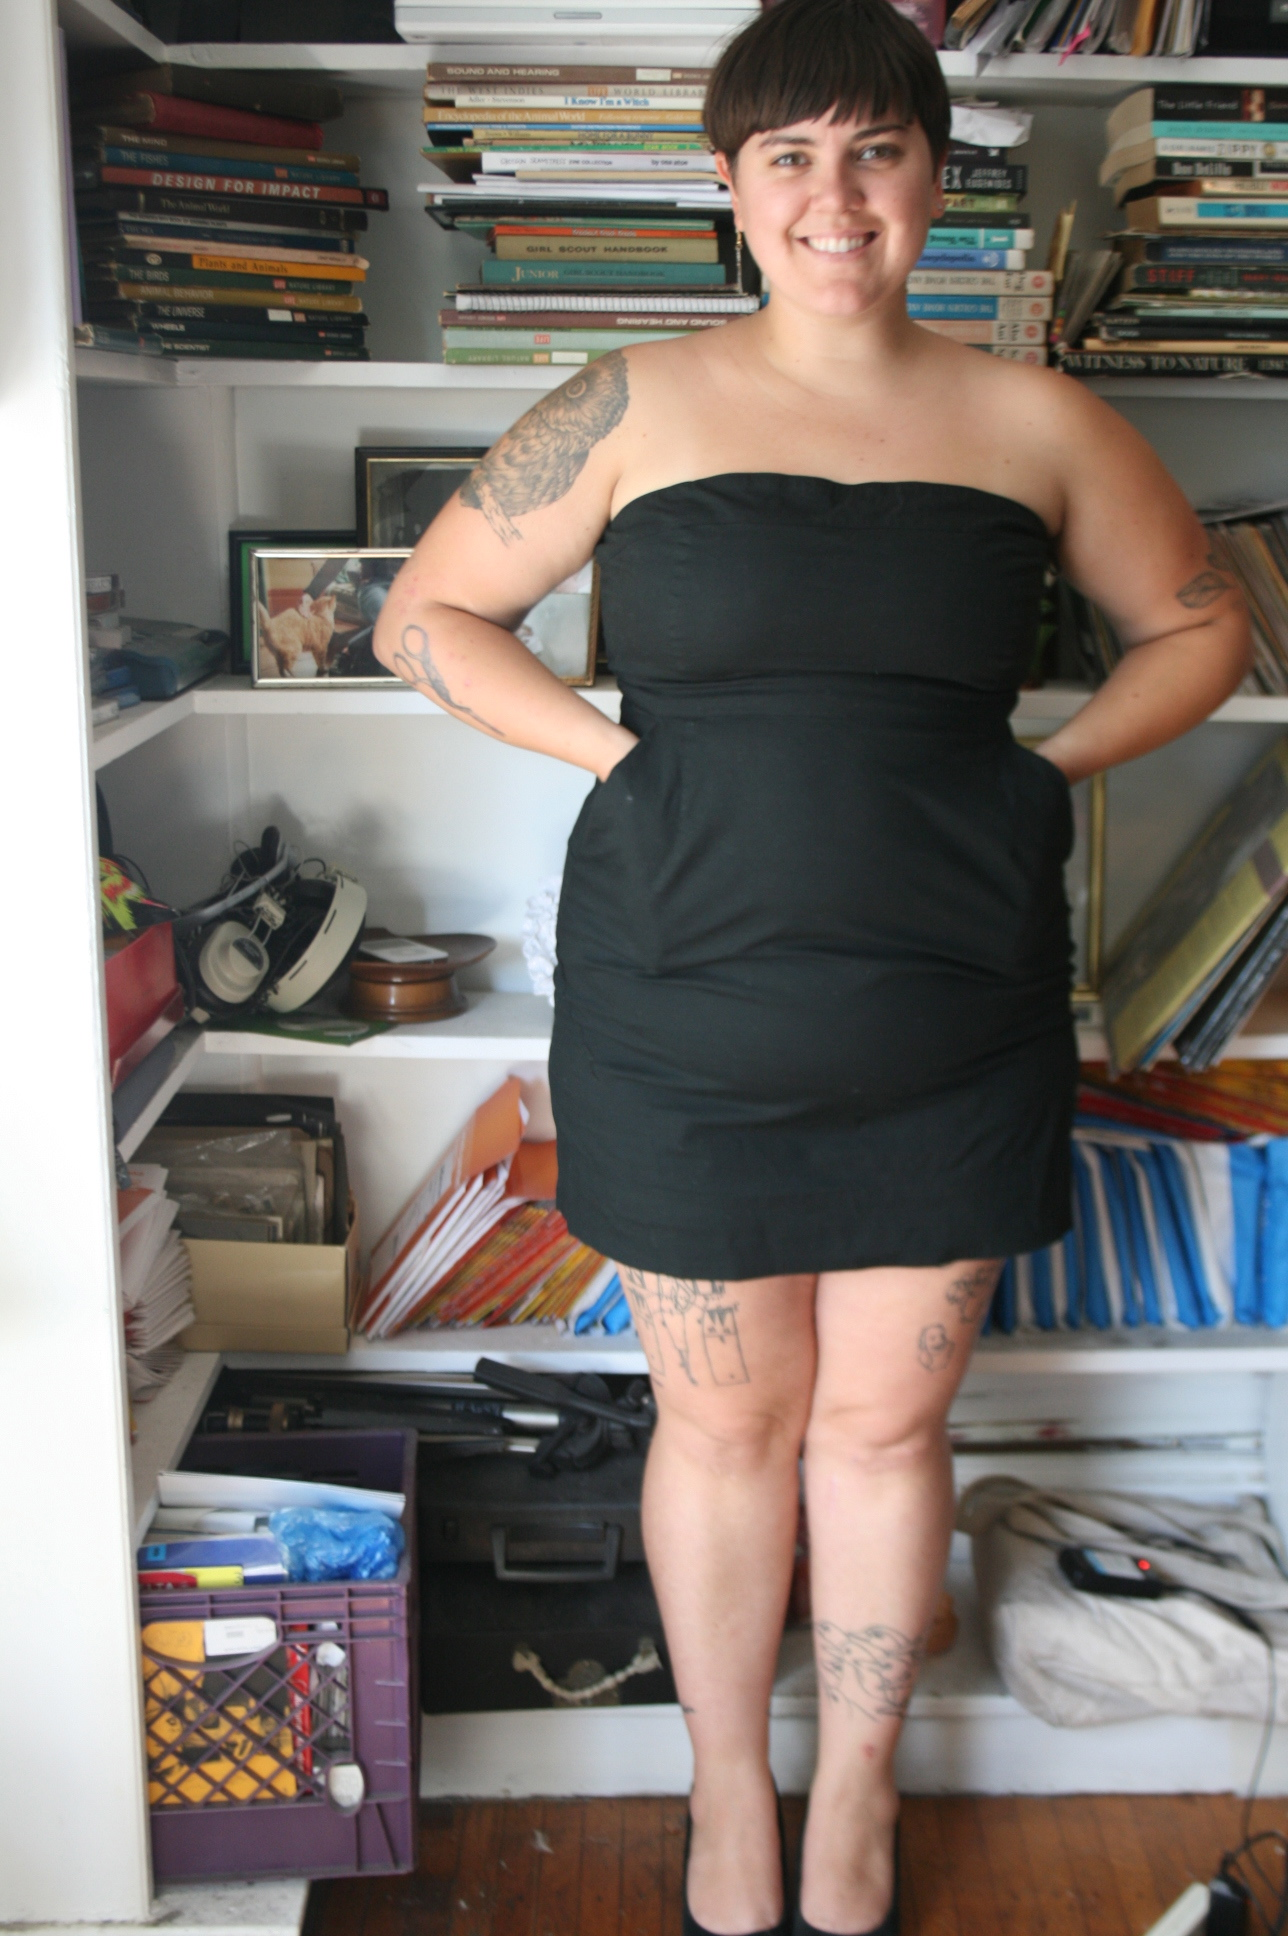 b53e4938802 Plus Size Black Strapless Tube Dress Size 16 NY CO on Storenvy